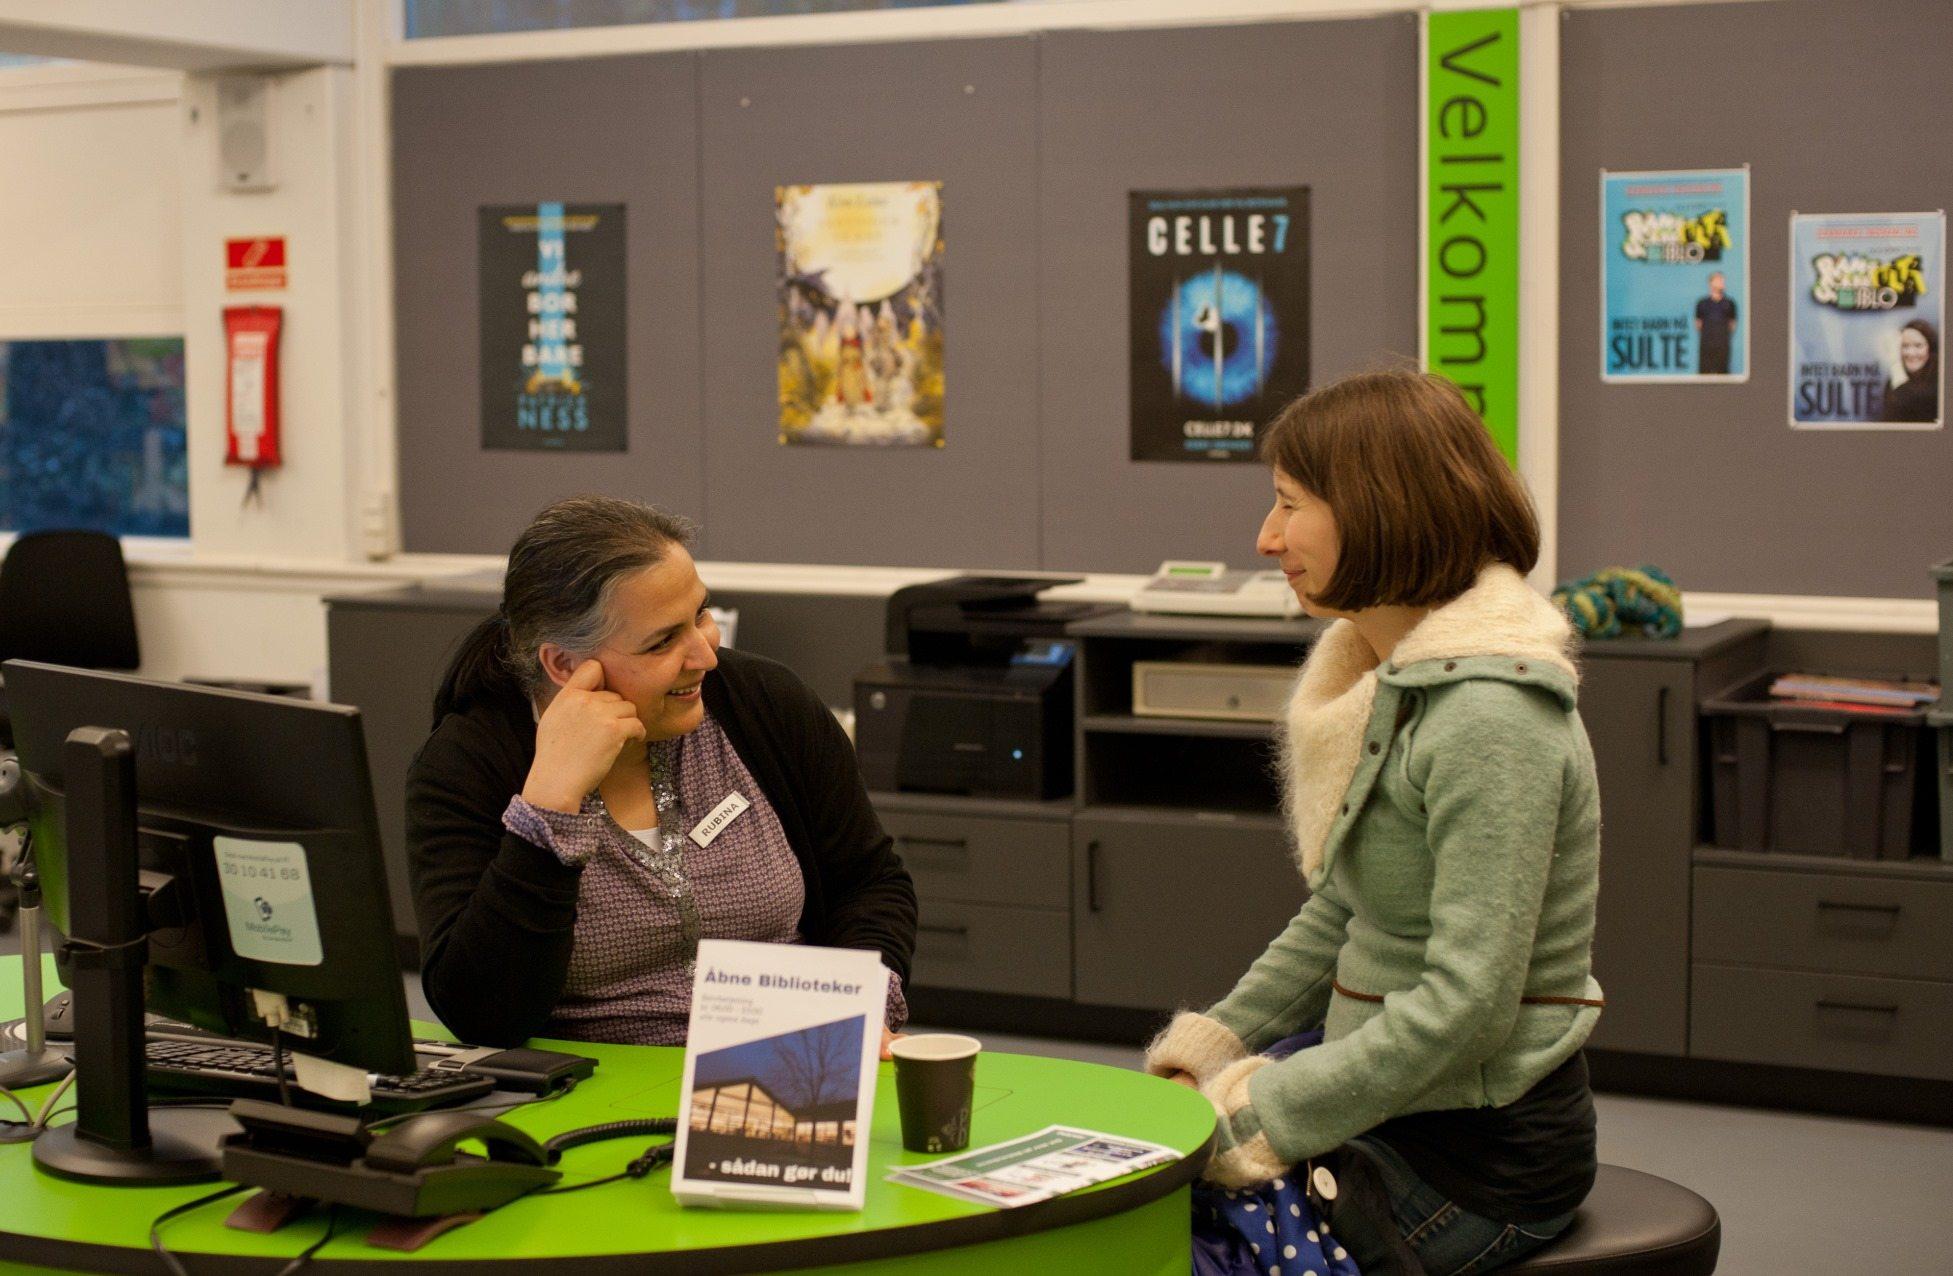 Rubina åbne biblioteker